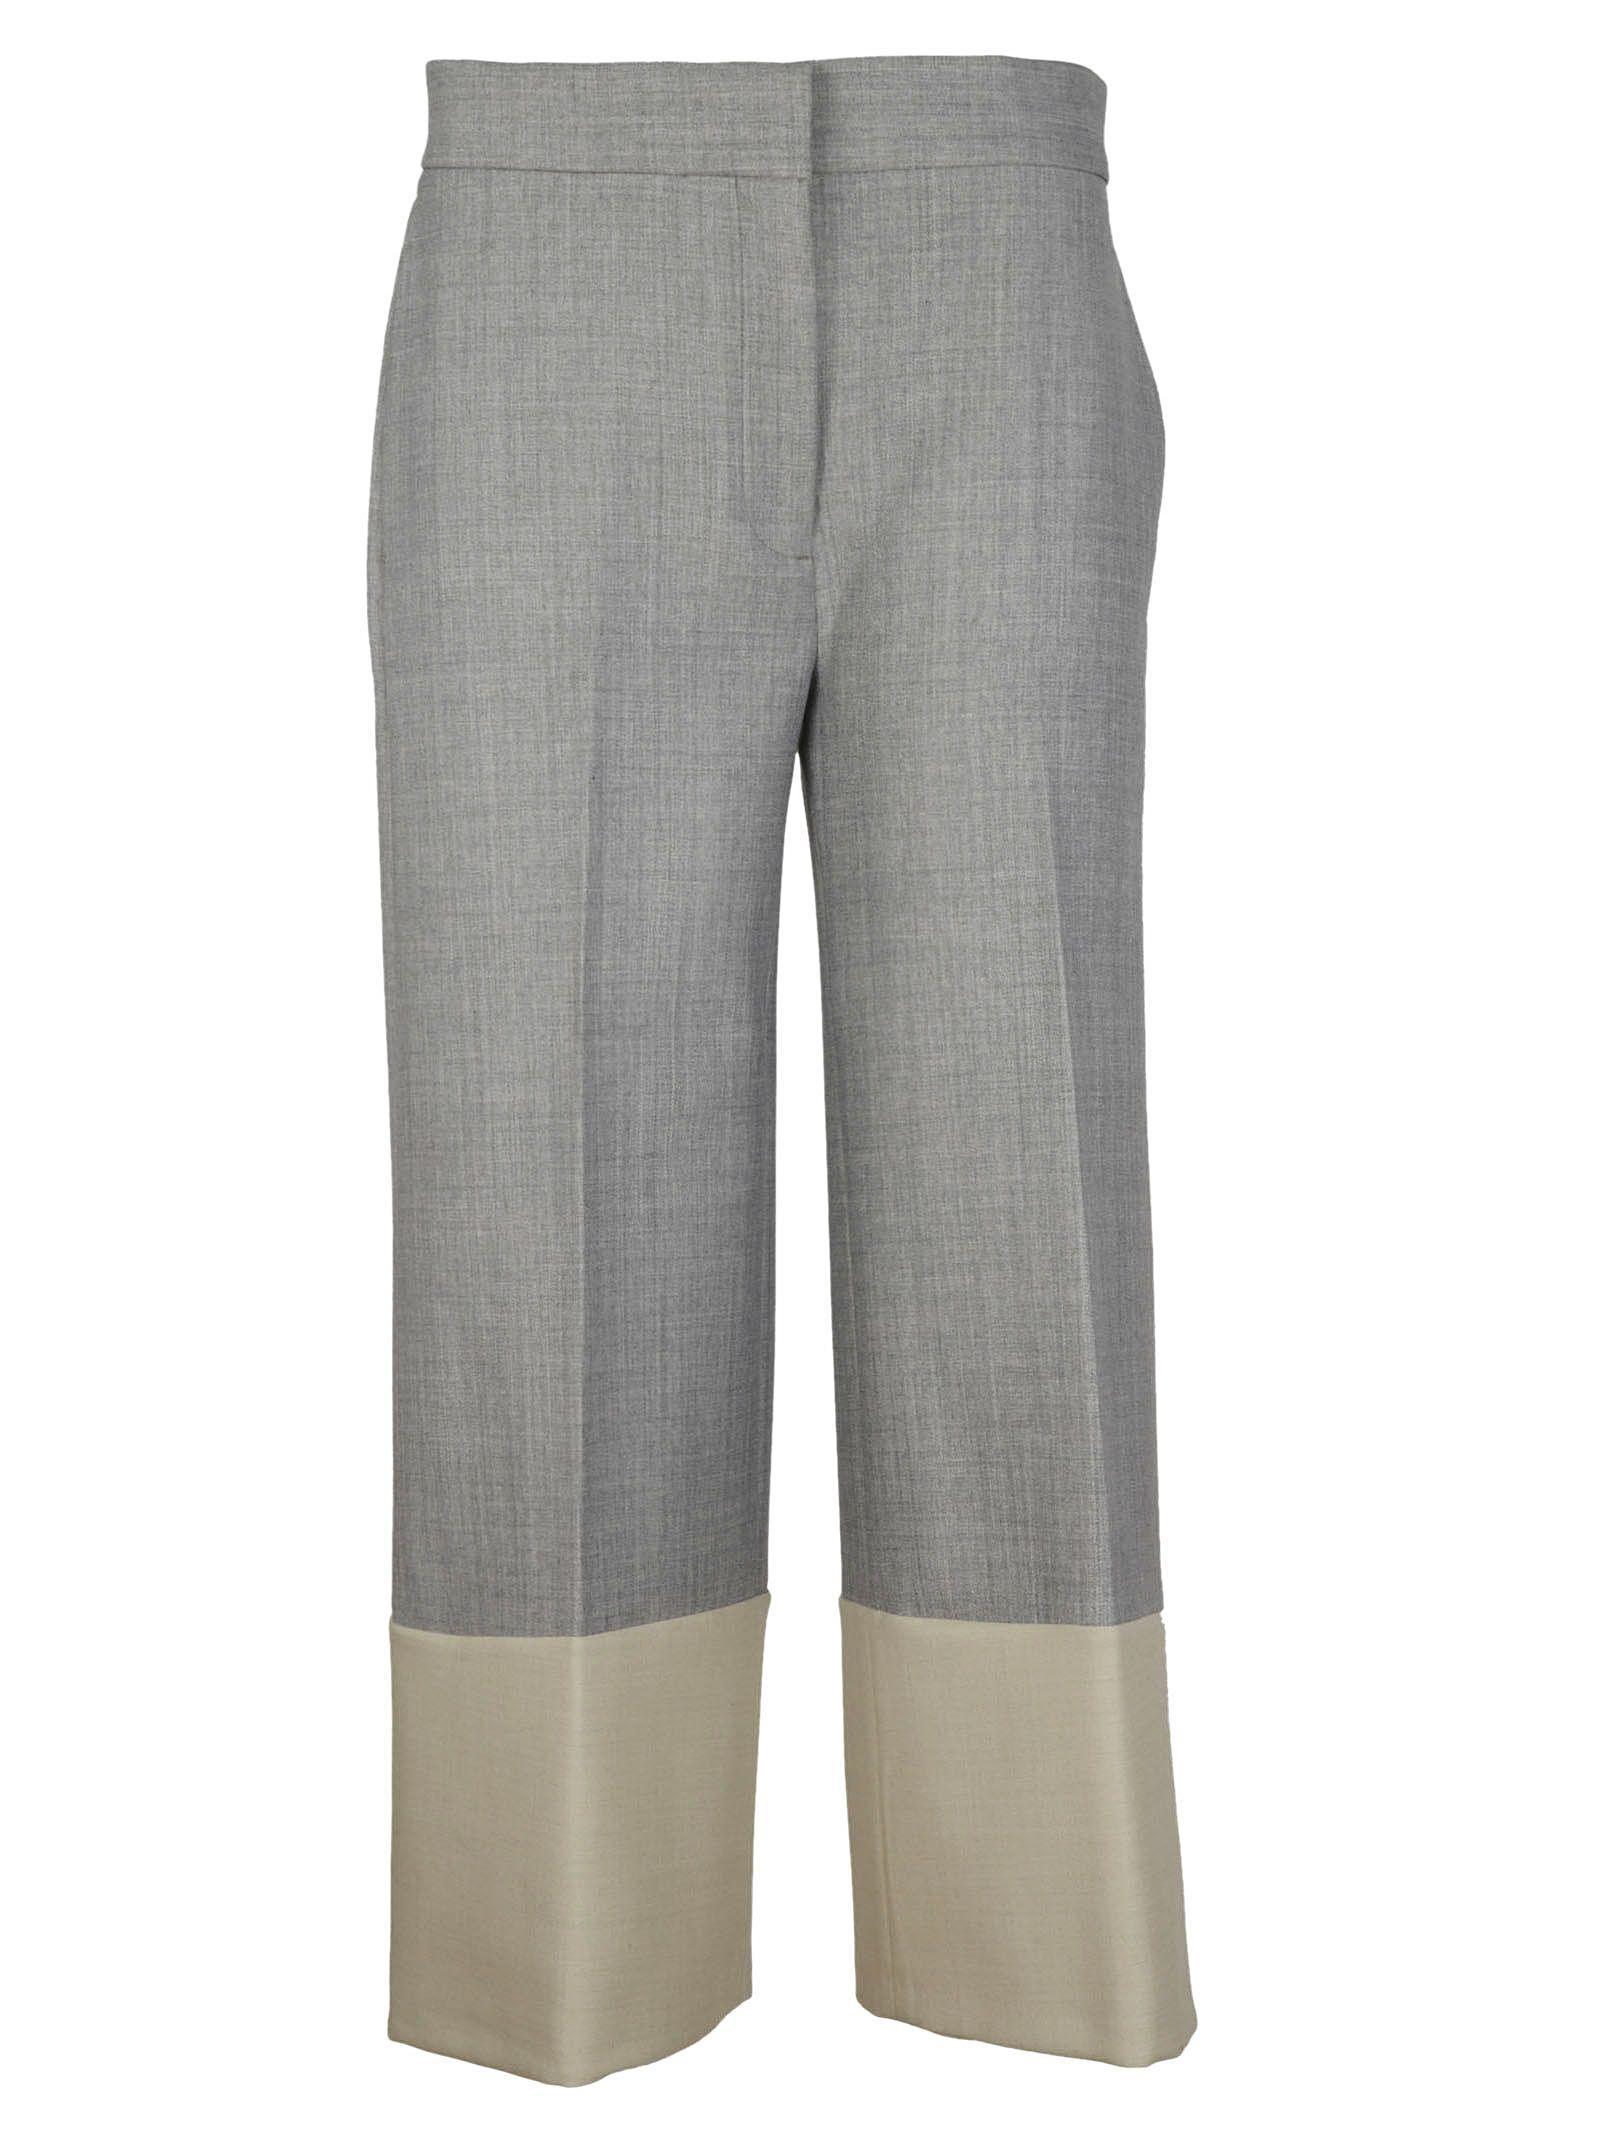 Victoria Beckham Cropped Trousers In Dark Grey